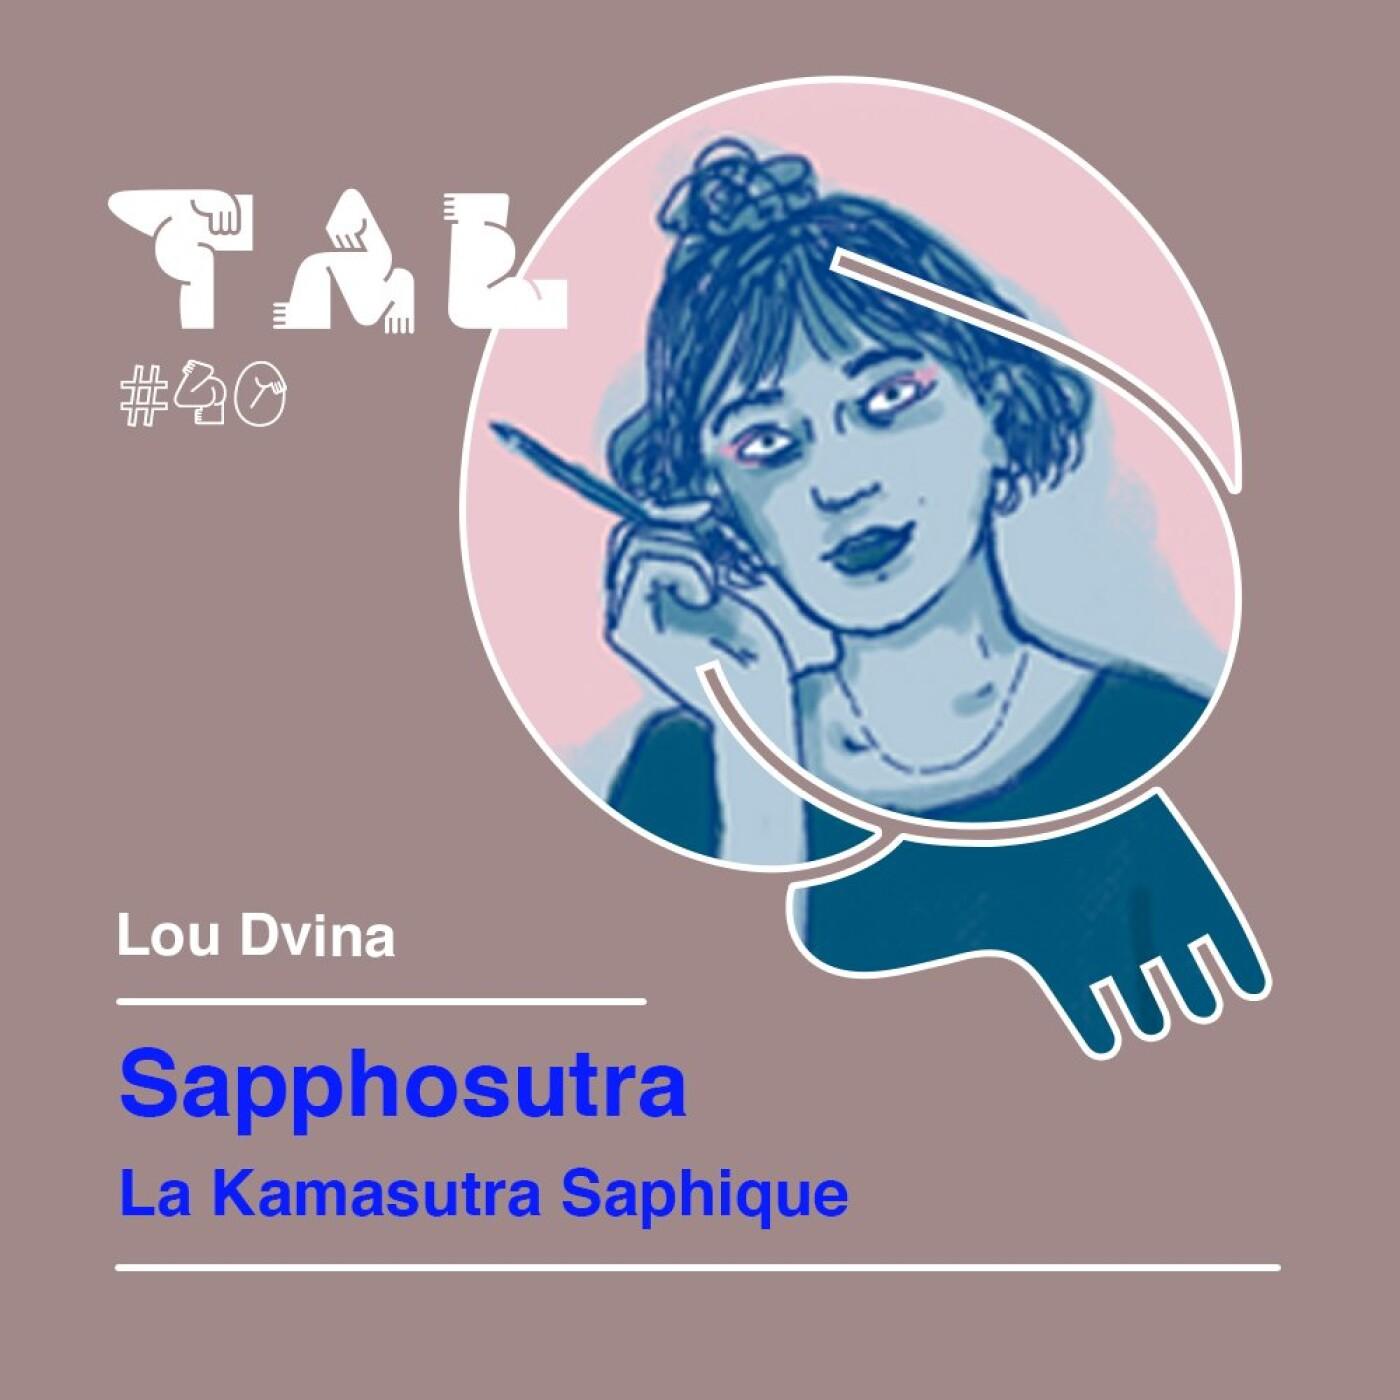 #40 - Lou Dvina : Sapphosutra, le Kamasutra saphique